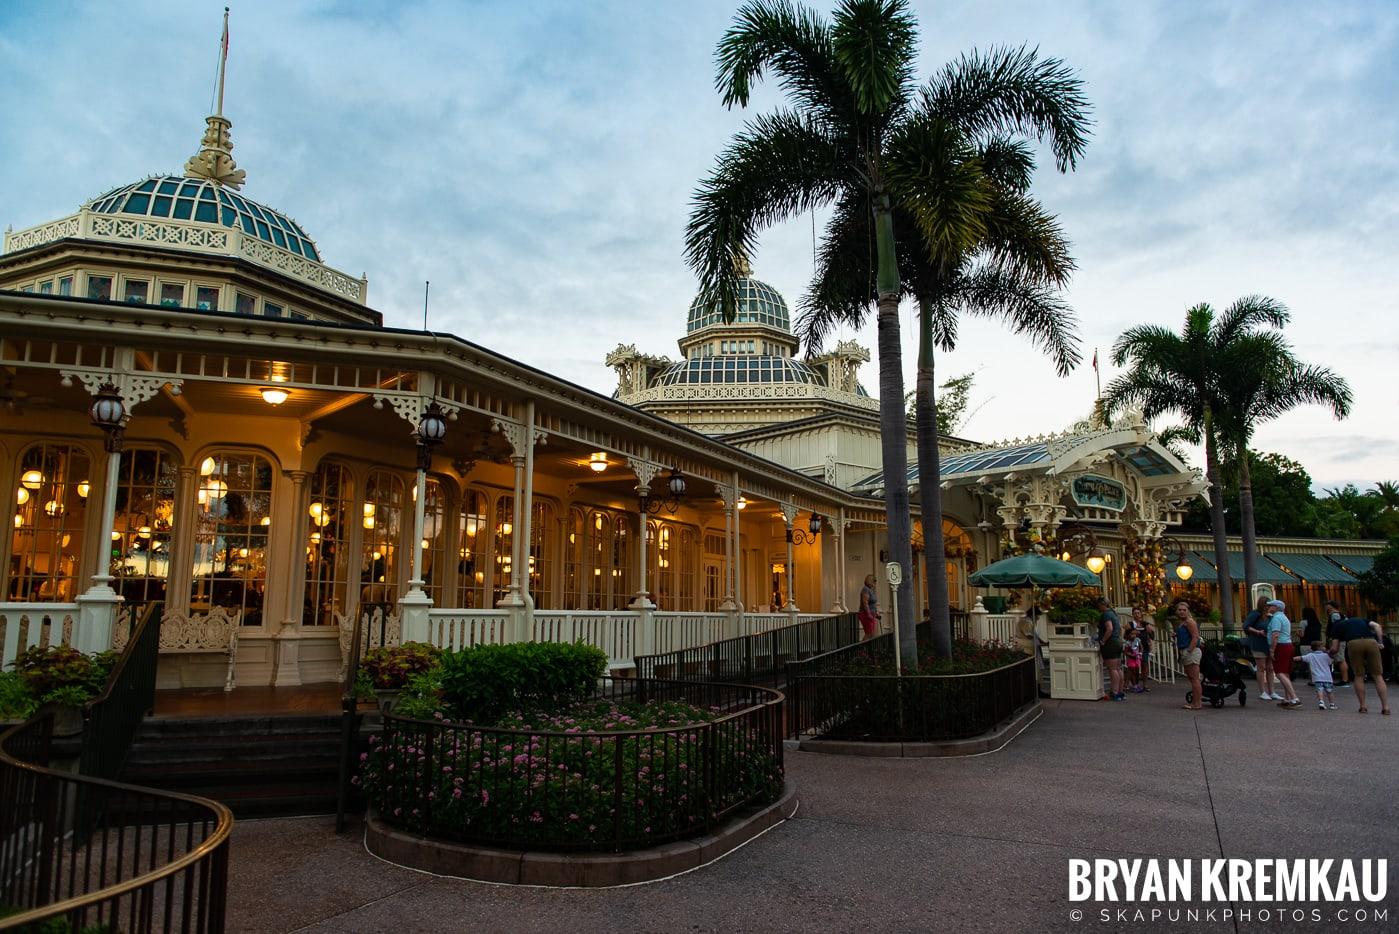 Walt Disney World Vacation: Day 6 (Magic Kingdom, Epcot, Disney's Hollywood Studios) - 10.4.19 (44)